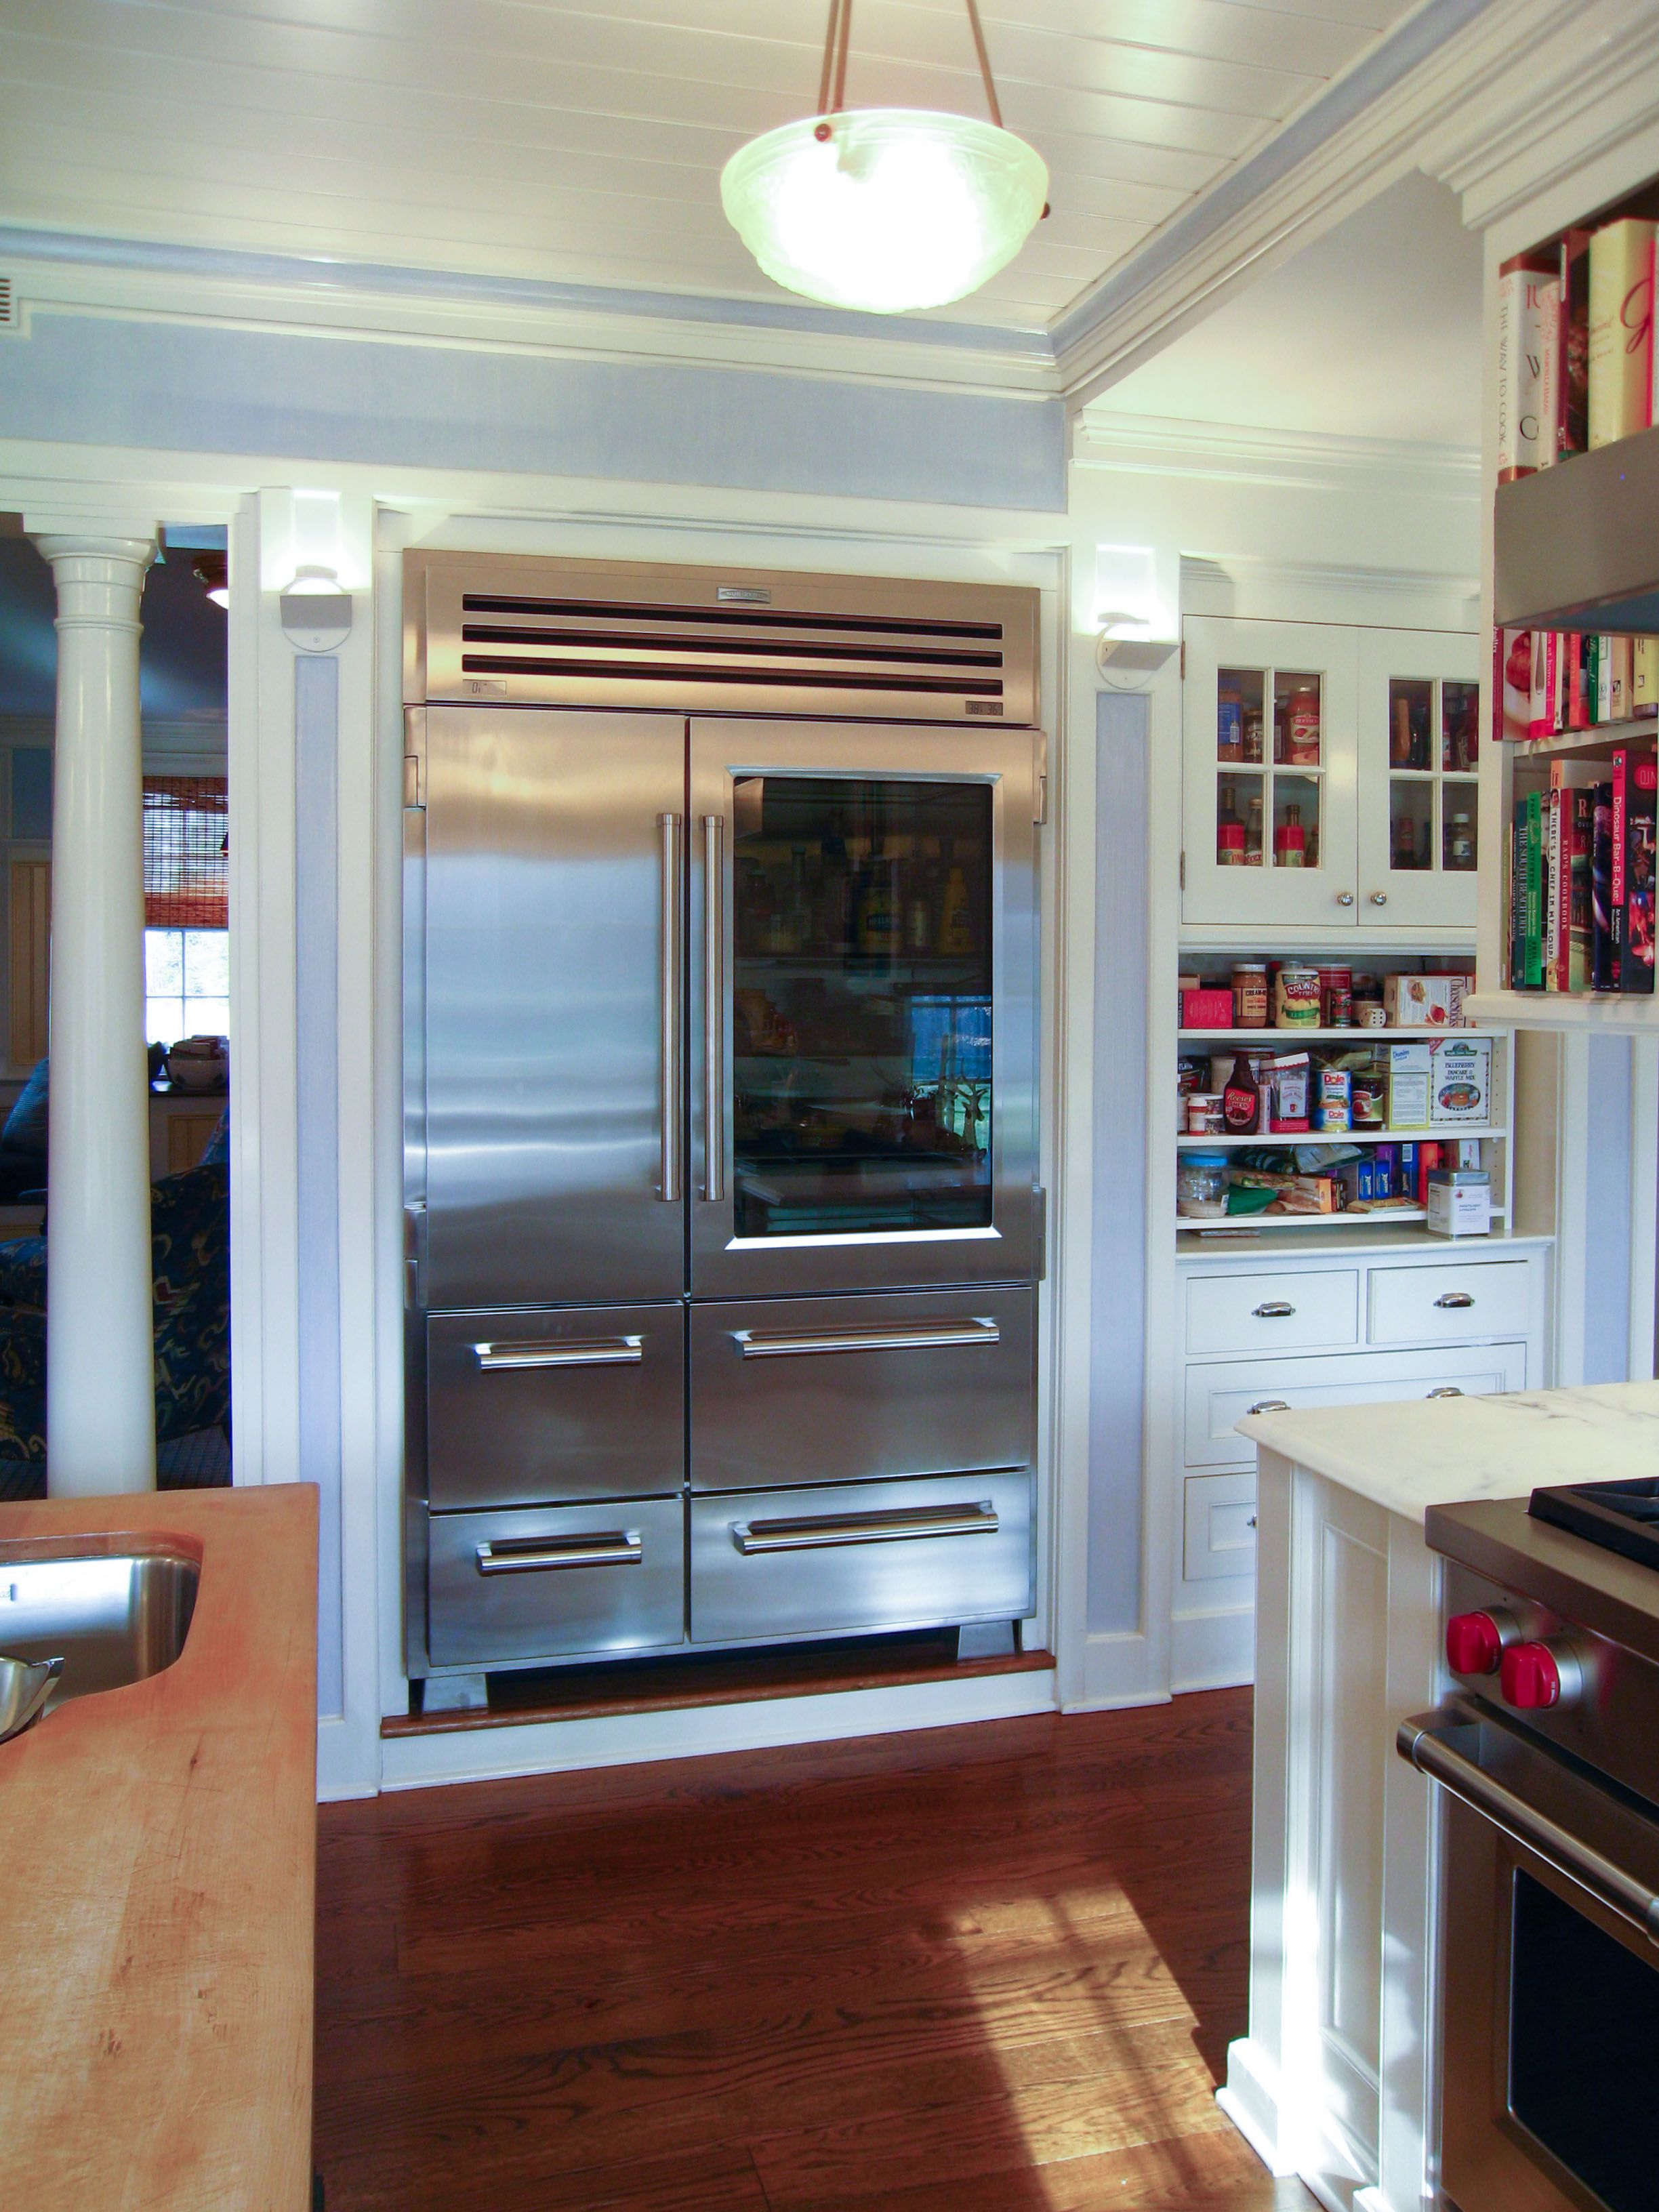 Fresco Of Stylish Design Of Glass Door Refrigerator Residential That